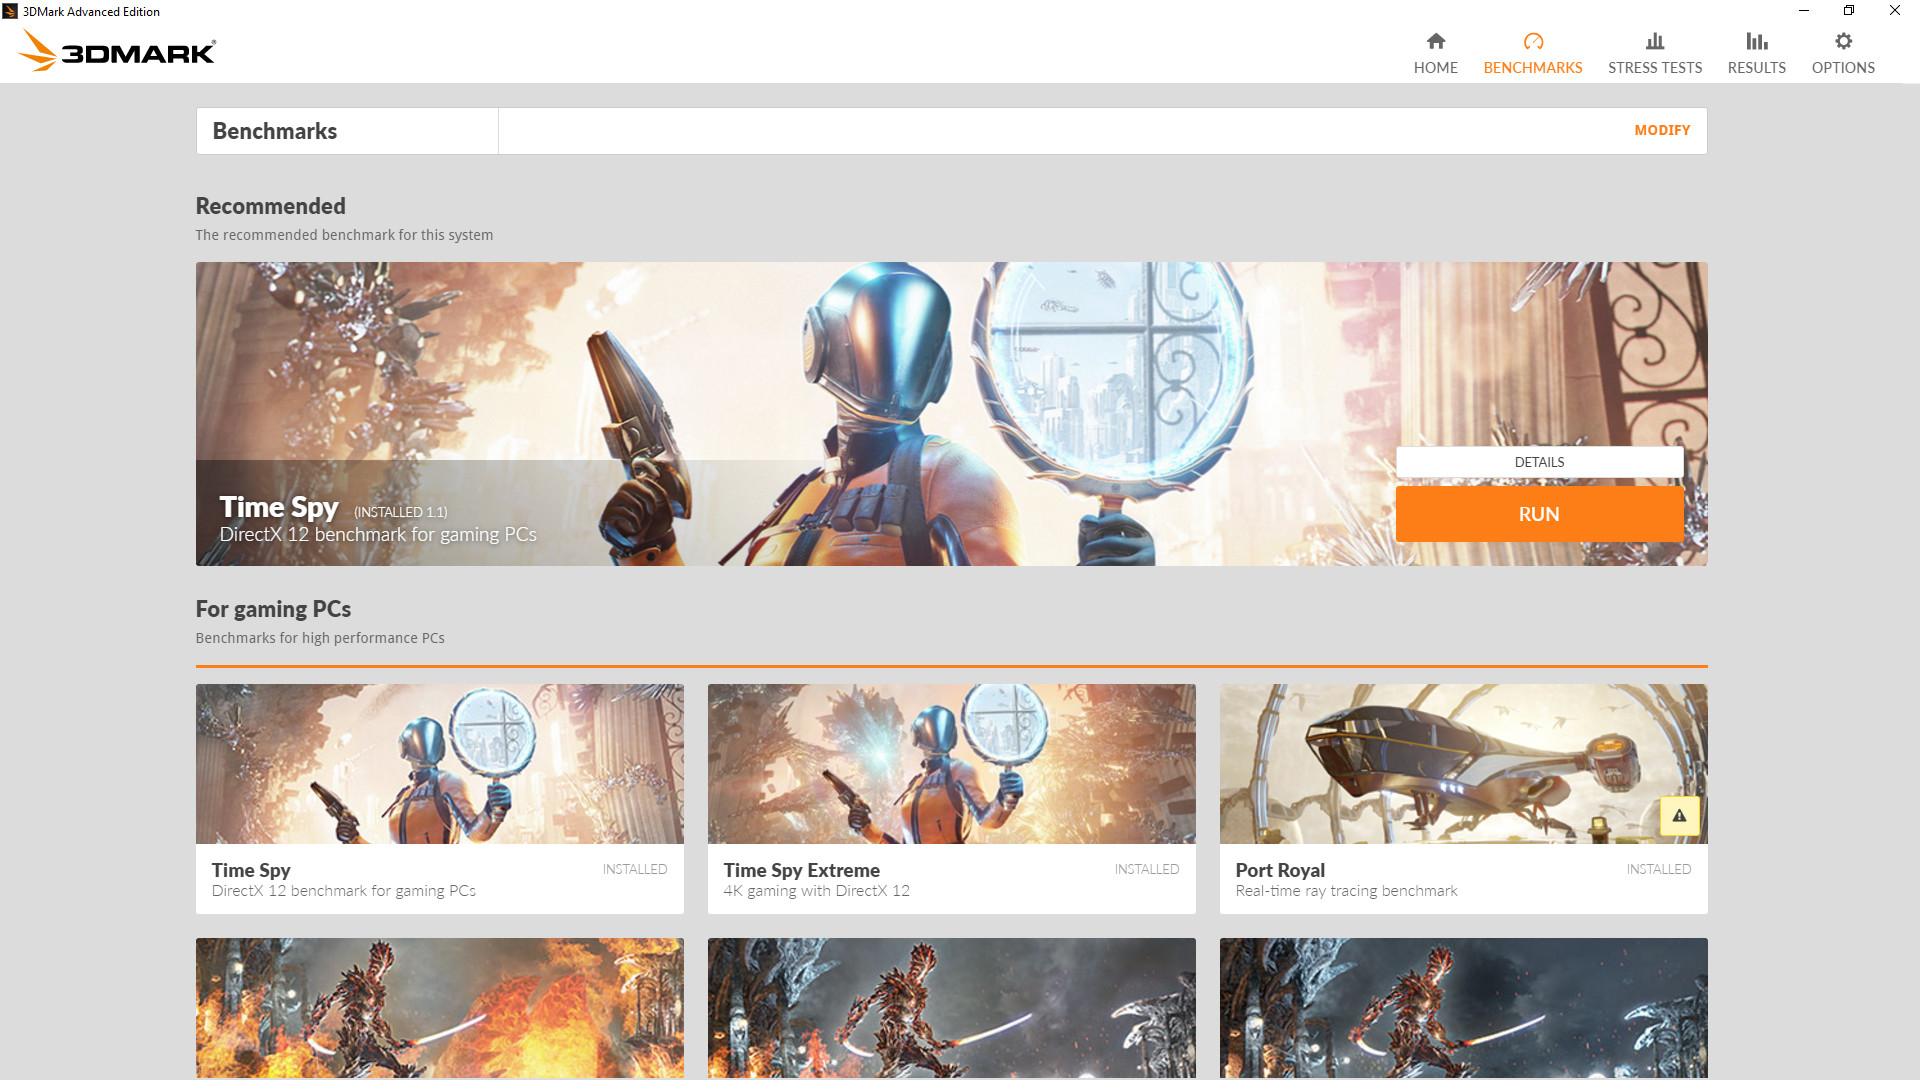 3DMark screenshot